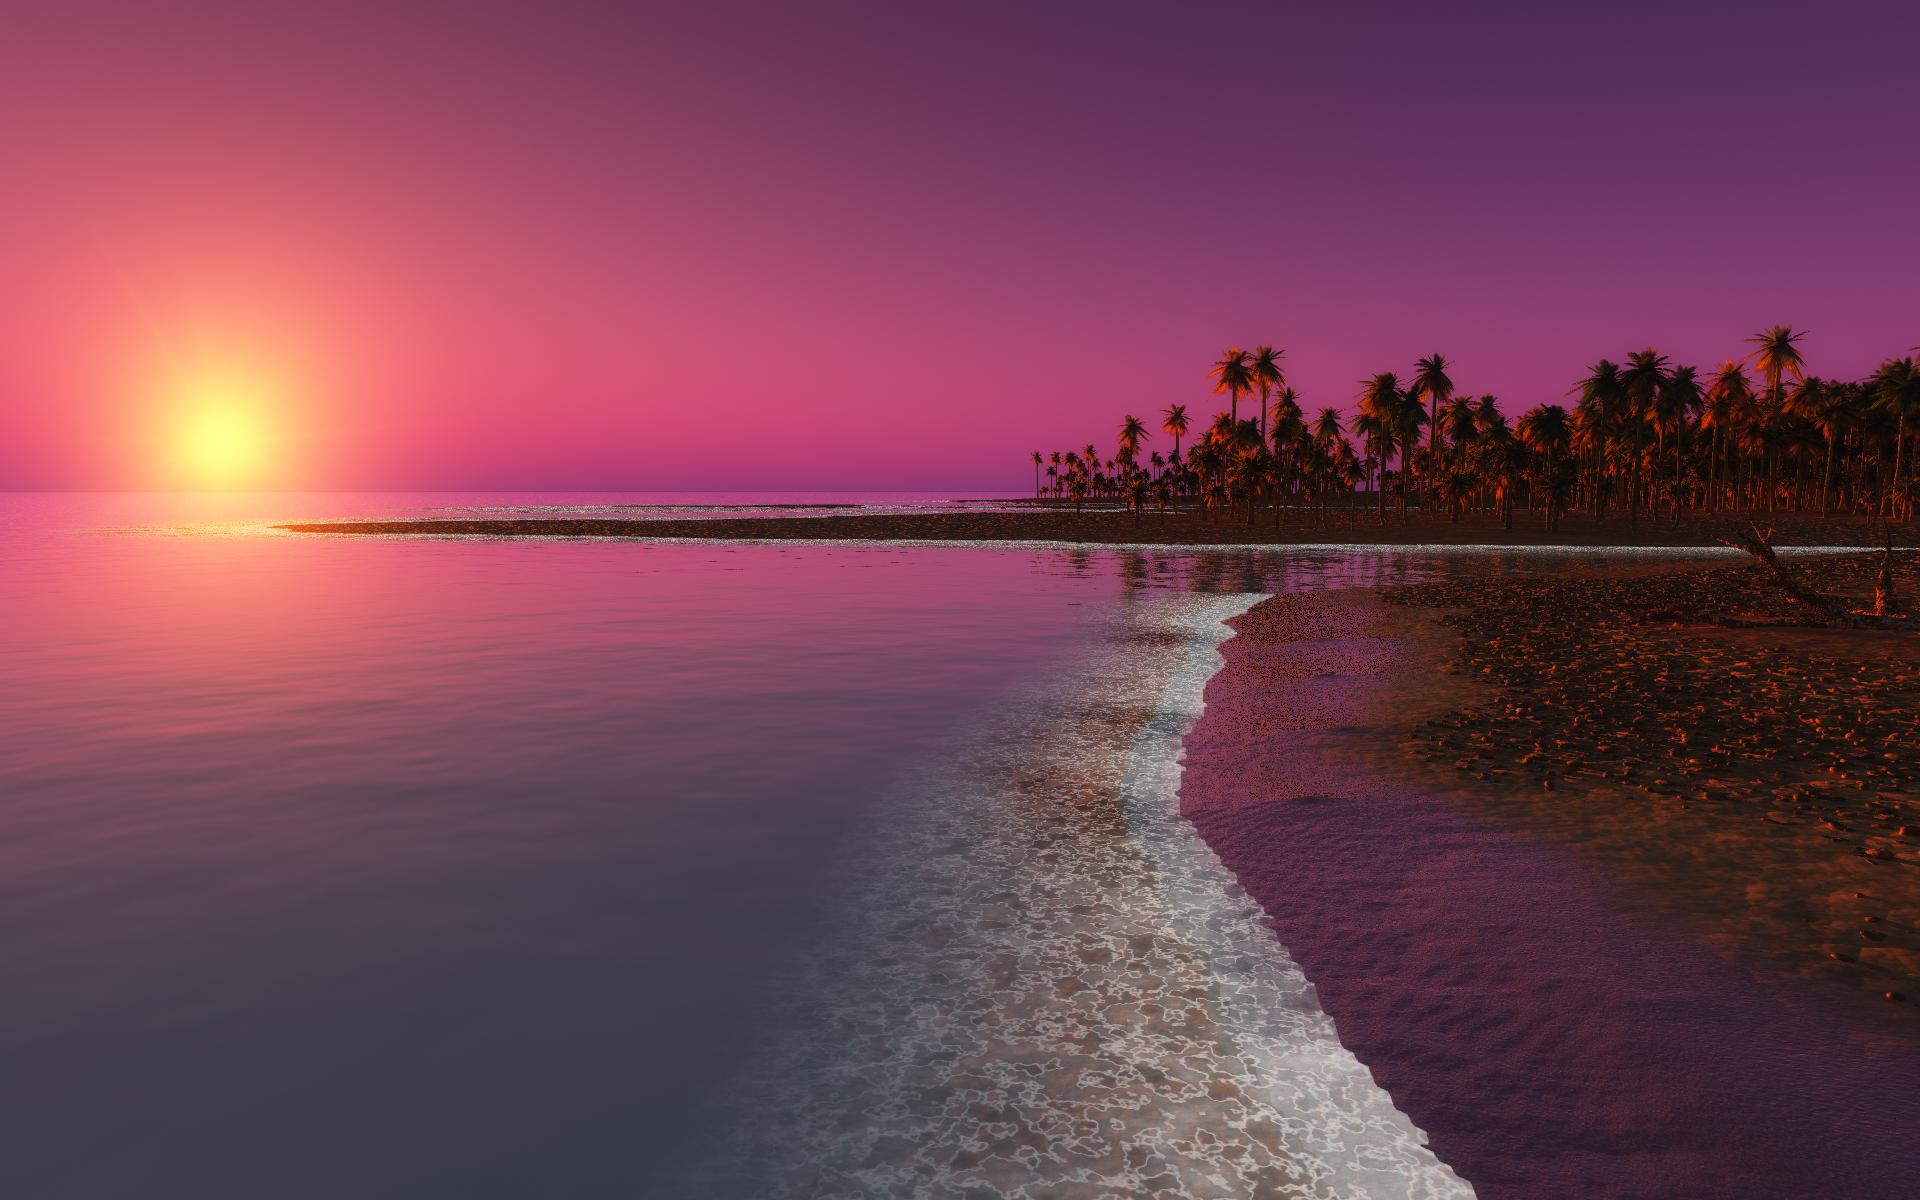 Purple Summer Desktop Wallpaper   HD Wallpapers 1920x1200